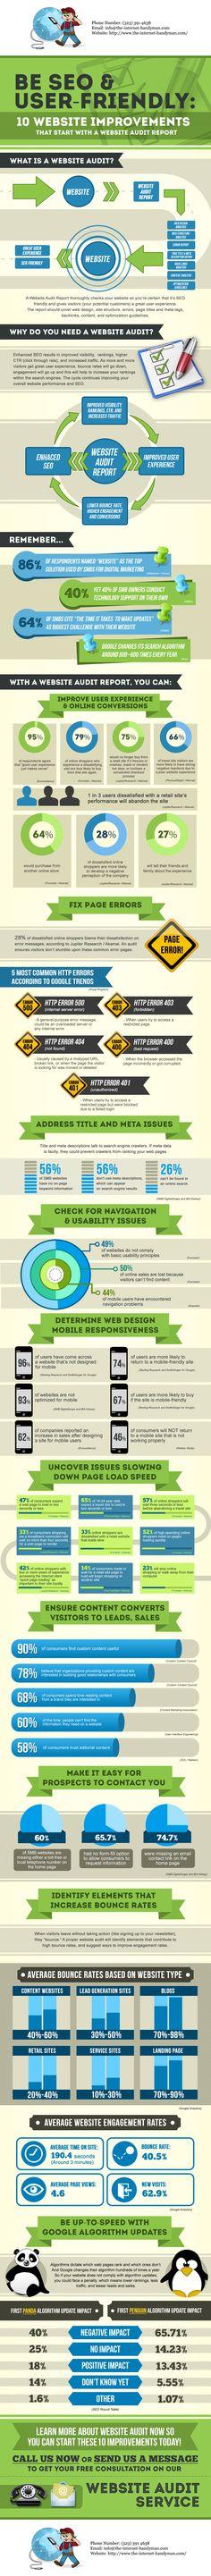 The-Internet-Handyman Website Audit Infographic